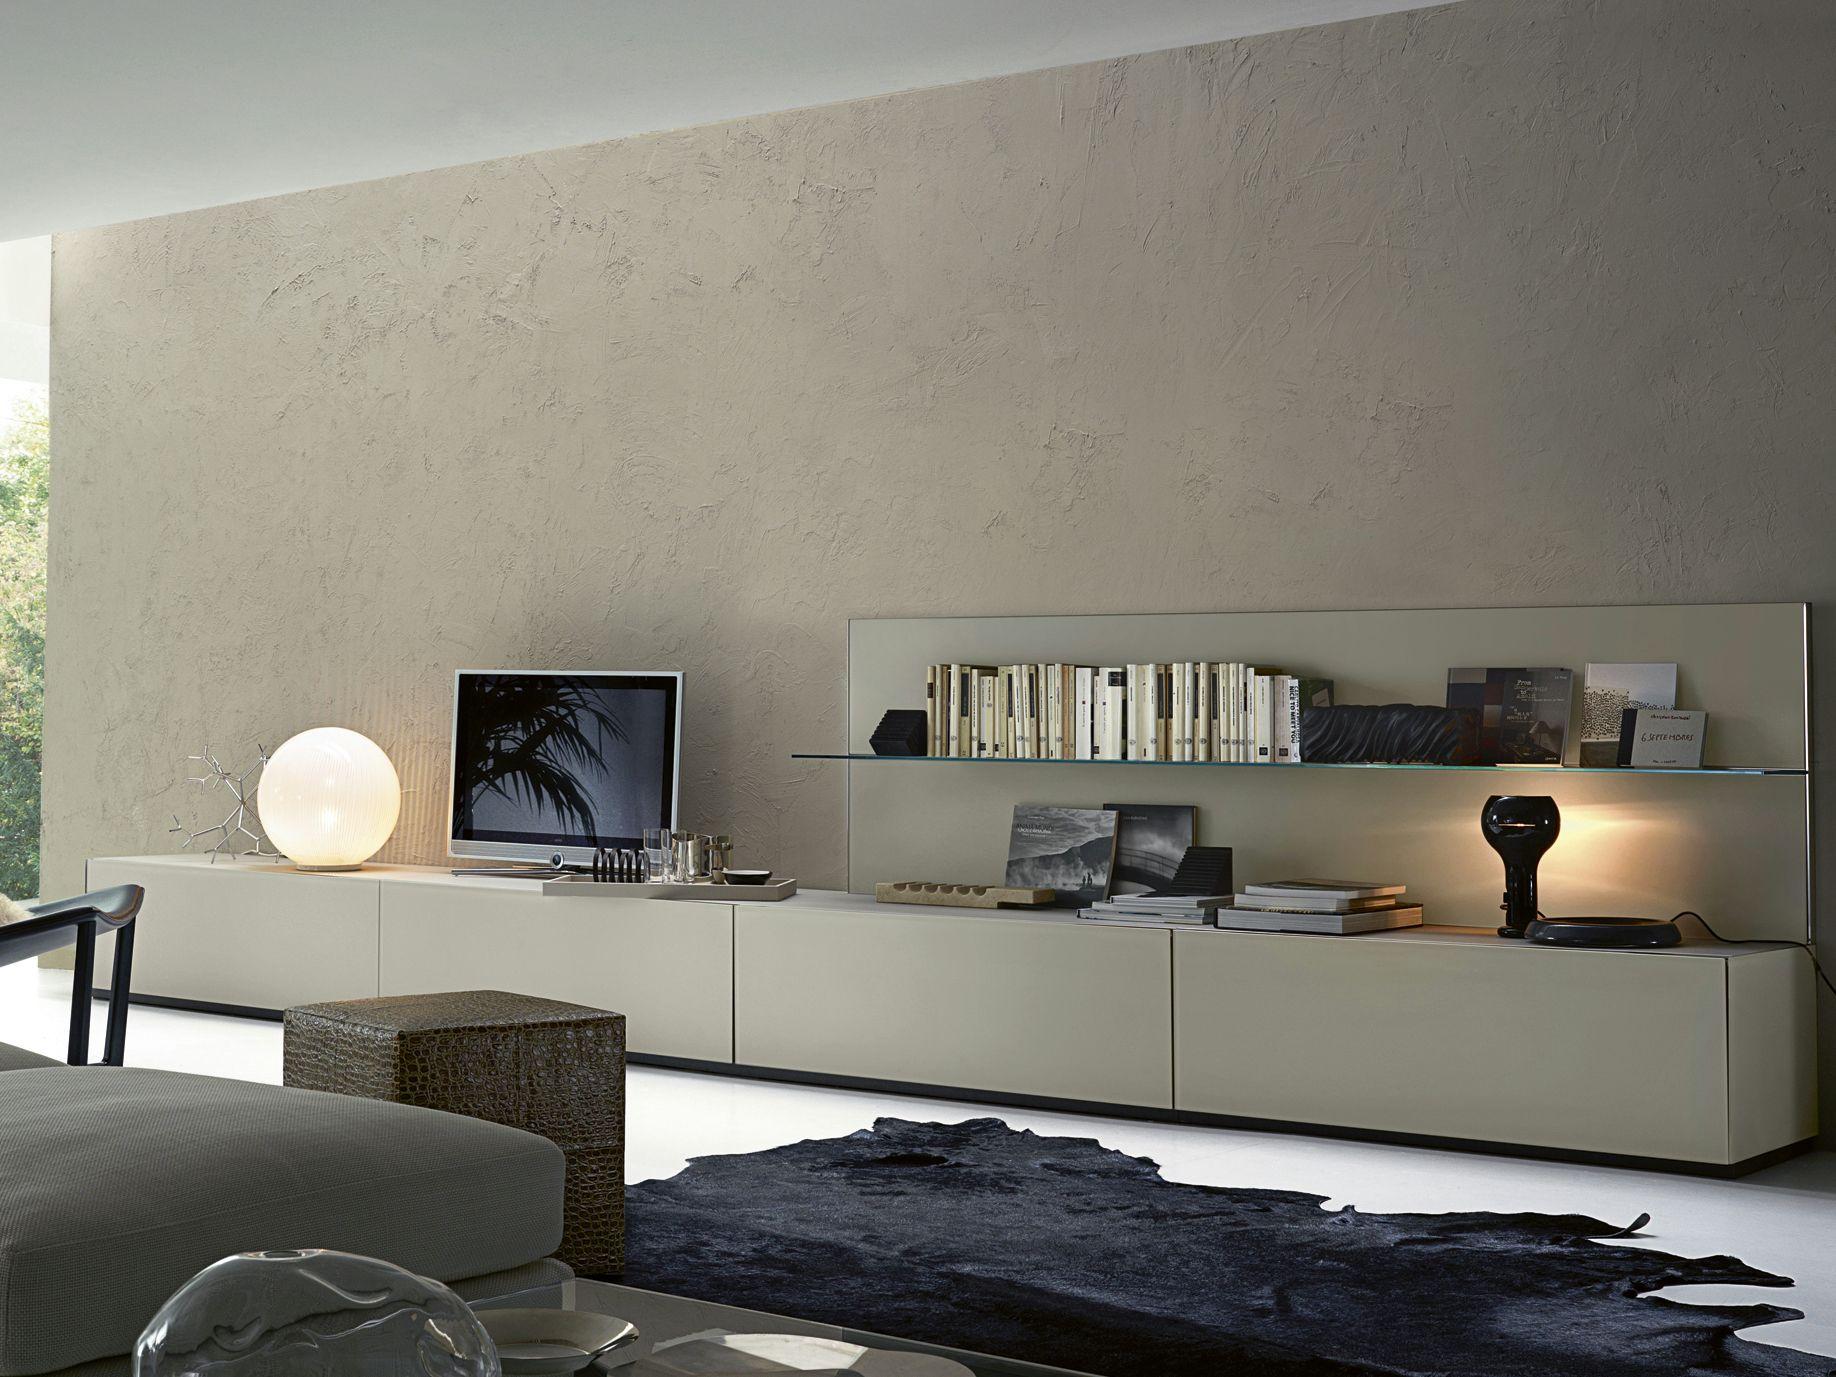 AIR TV Lowboard By Gallotti · Tv LowboardWohnwand ModernWohnzimmerHolz ...